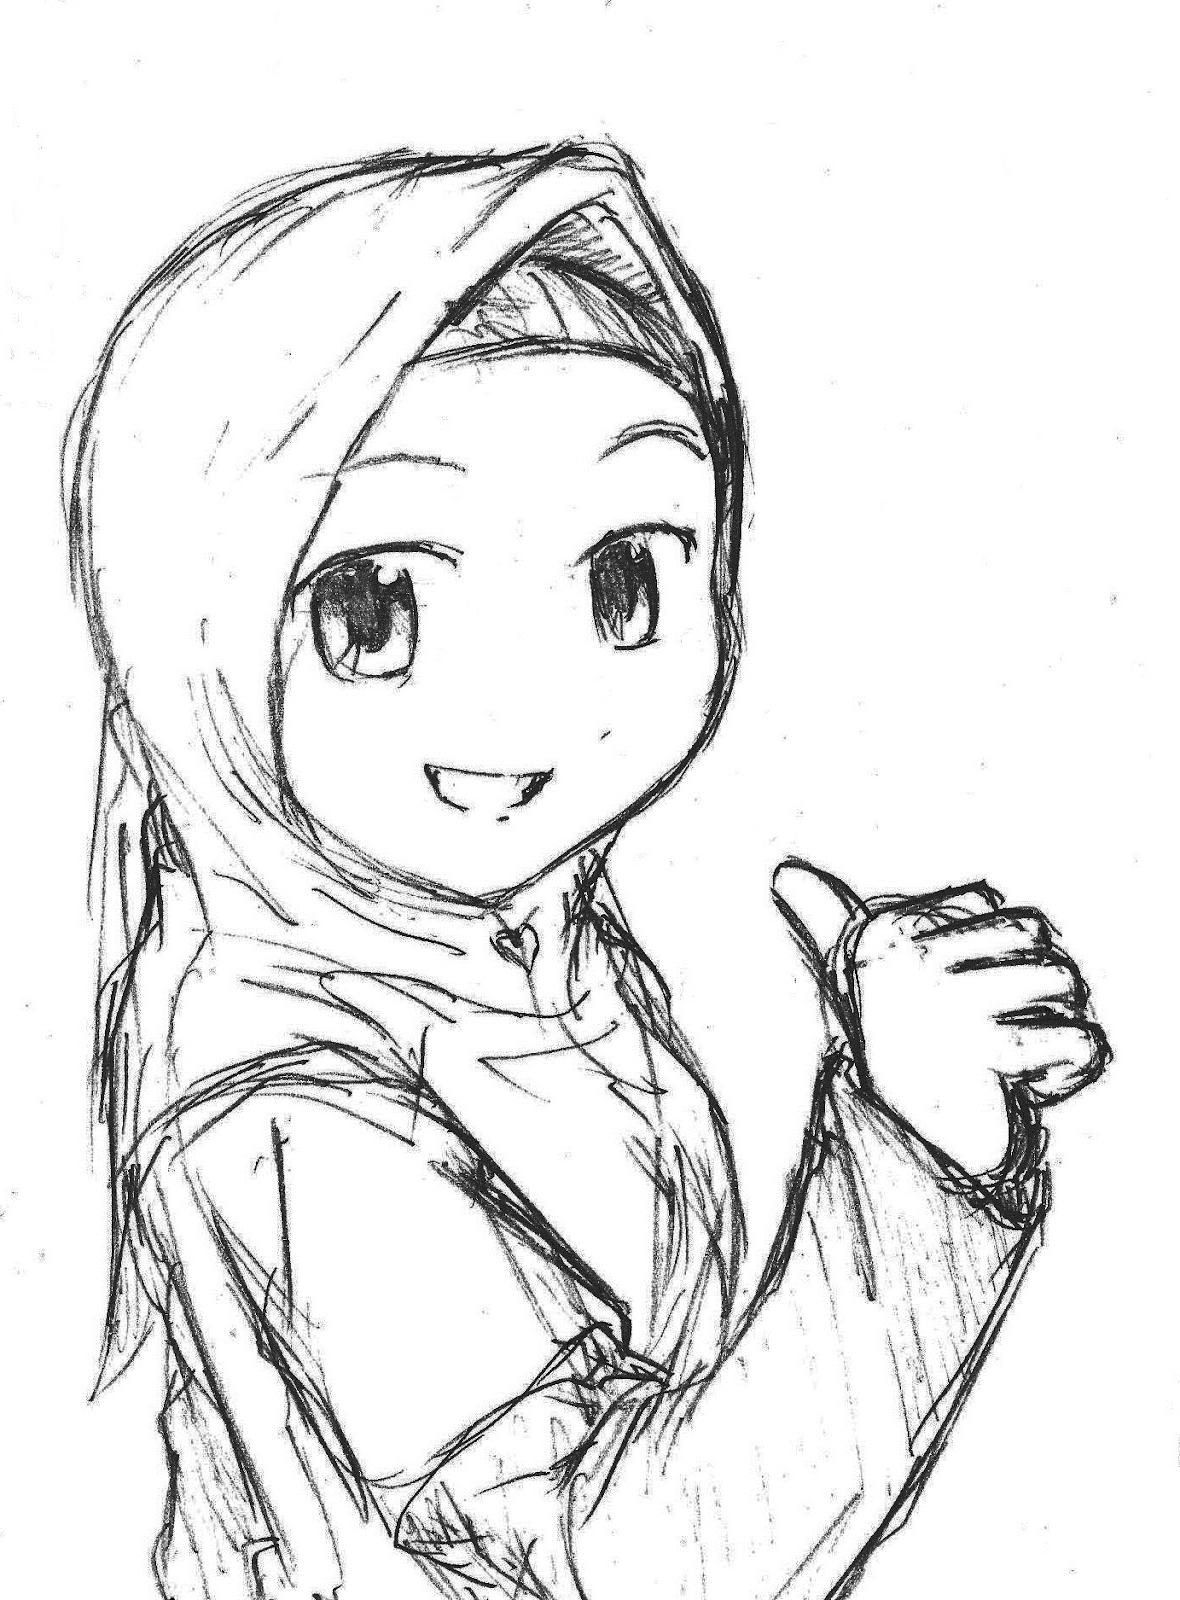 1180x1600 Girl Wearing Hijab Drawing Sketch Of A Girl Wearing A Hijab Sketch